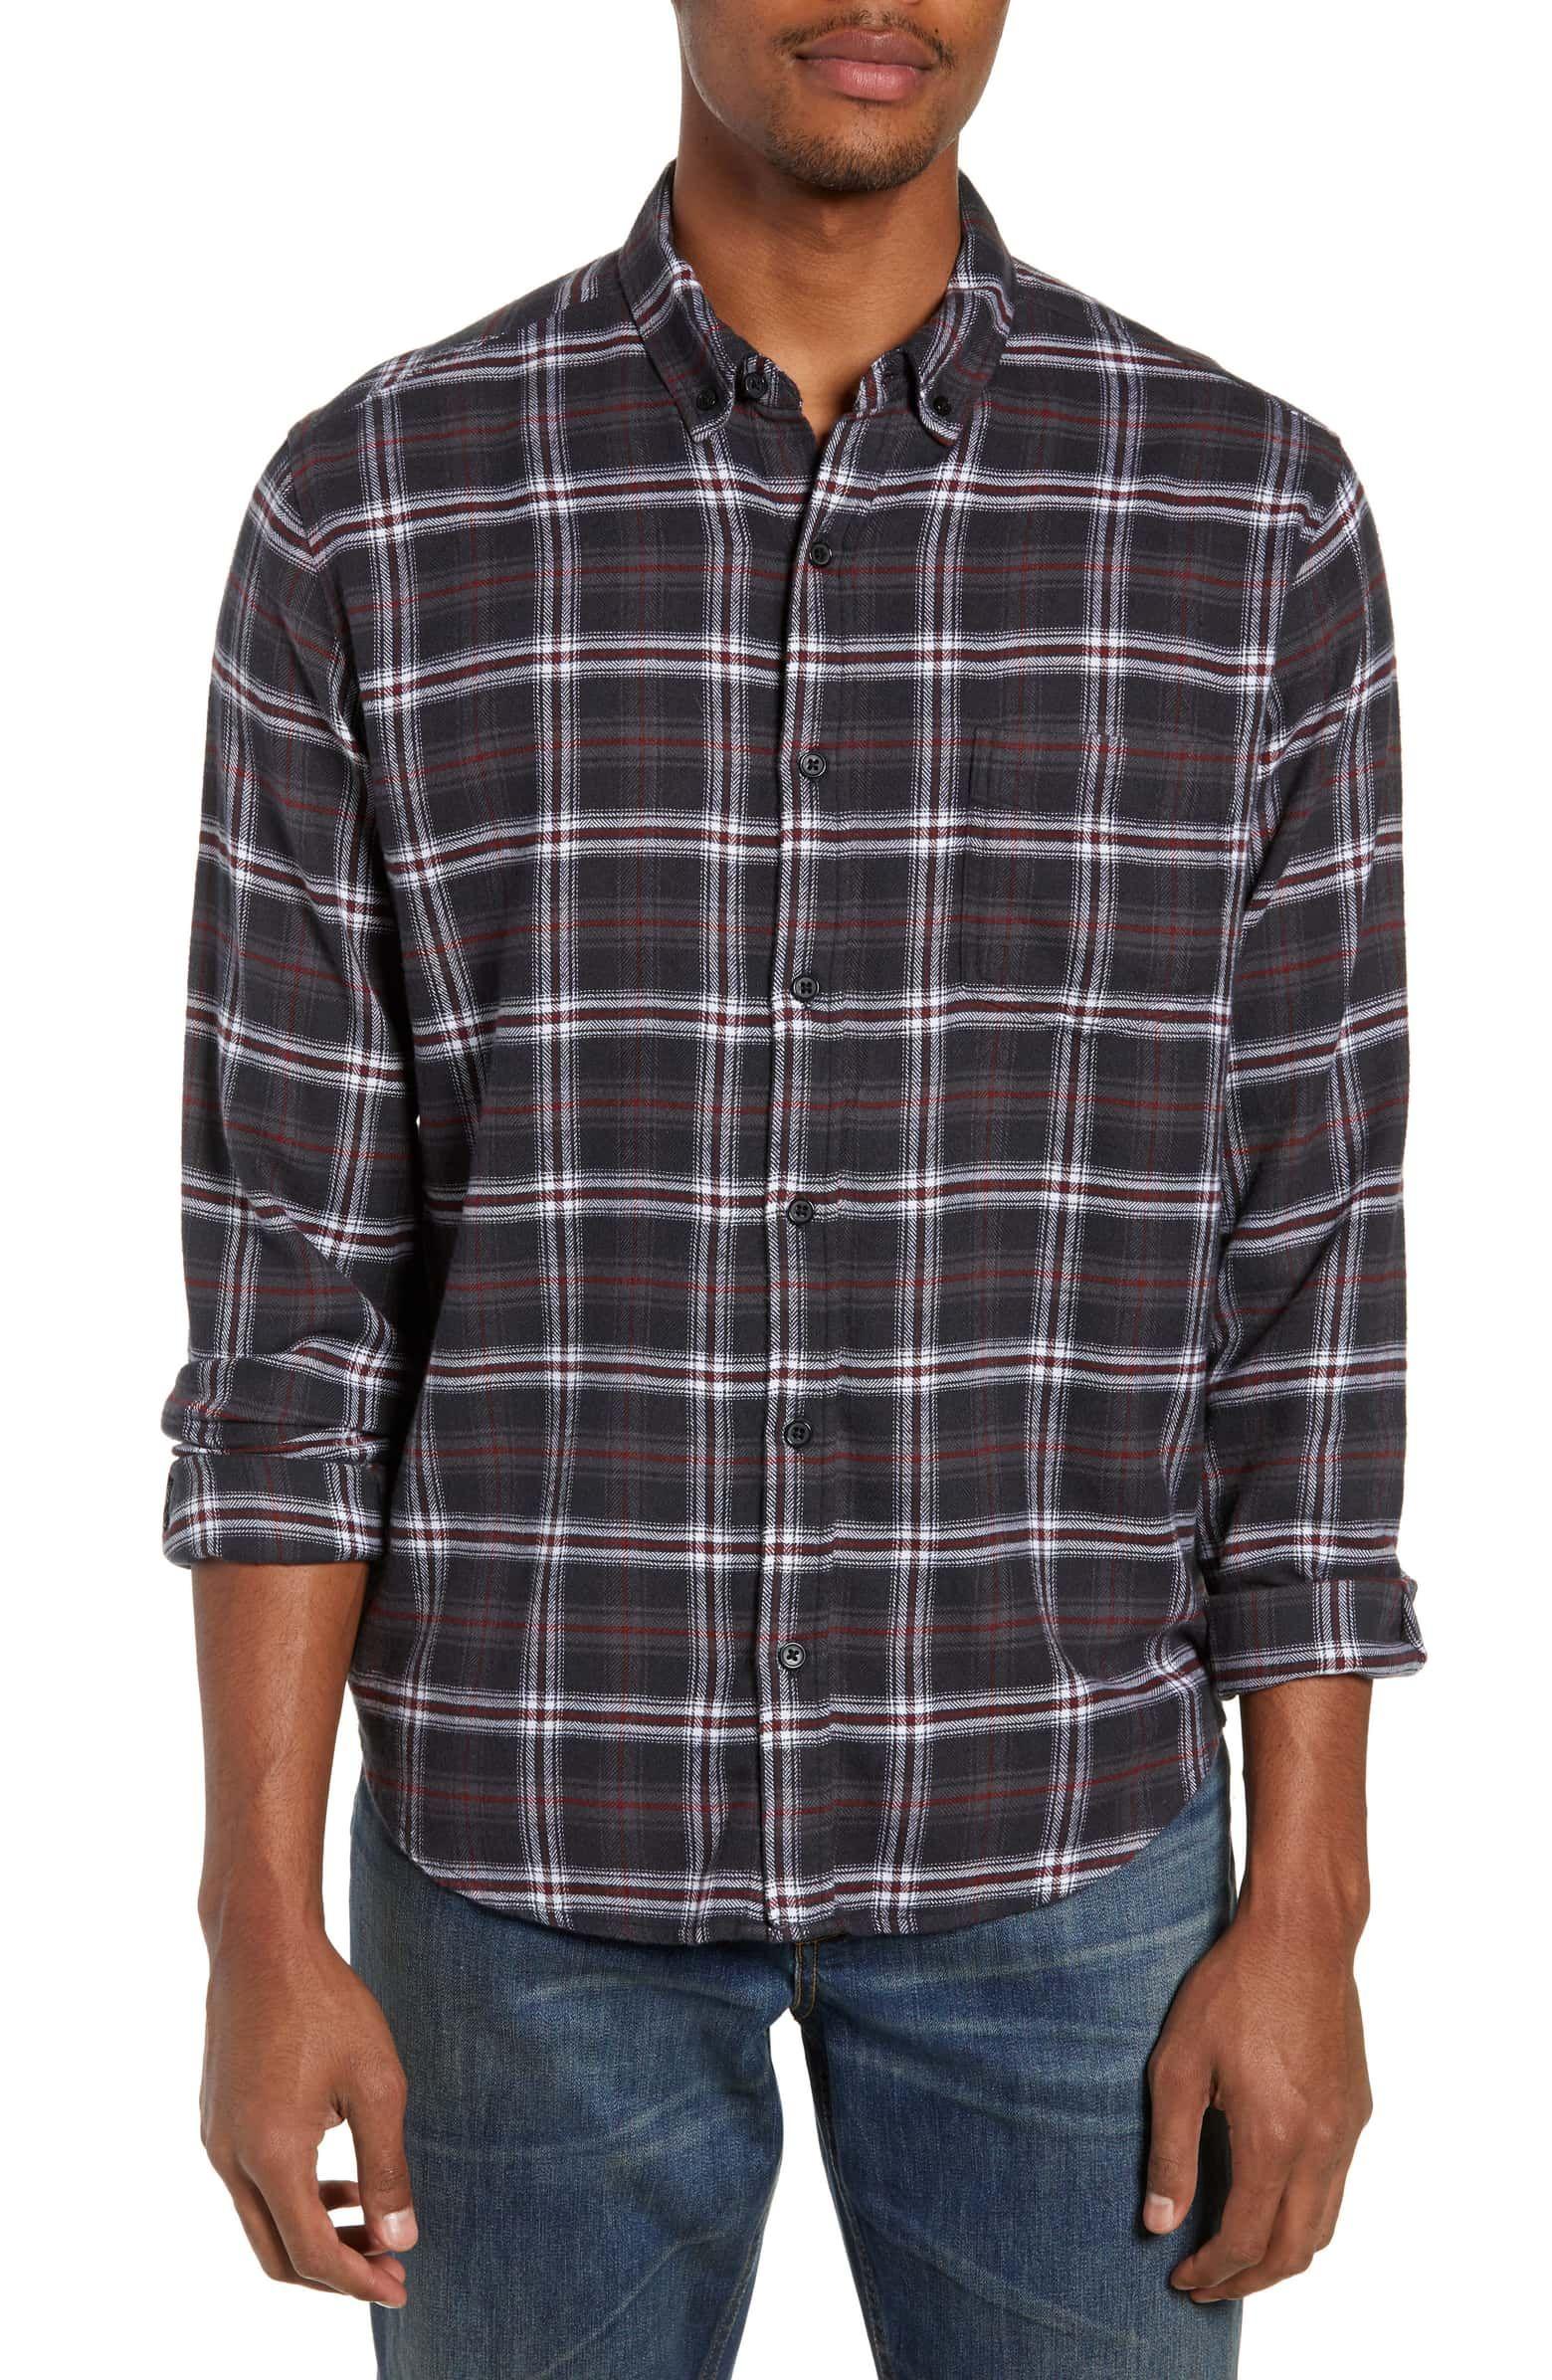 Alion Mens Short Sleeve Casual Button Down Shirt Plaid Checkered Work Shirts